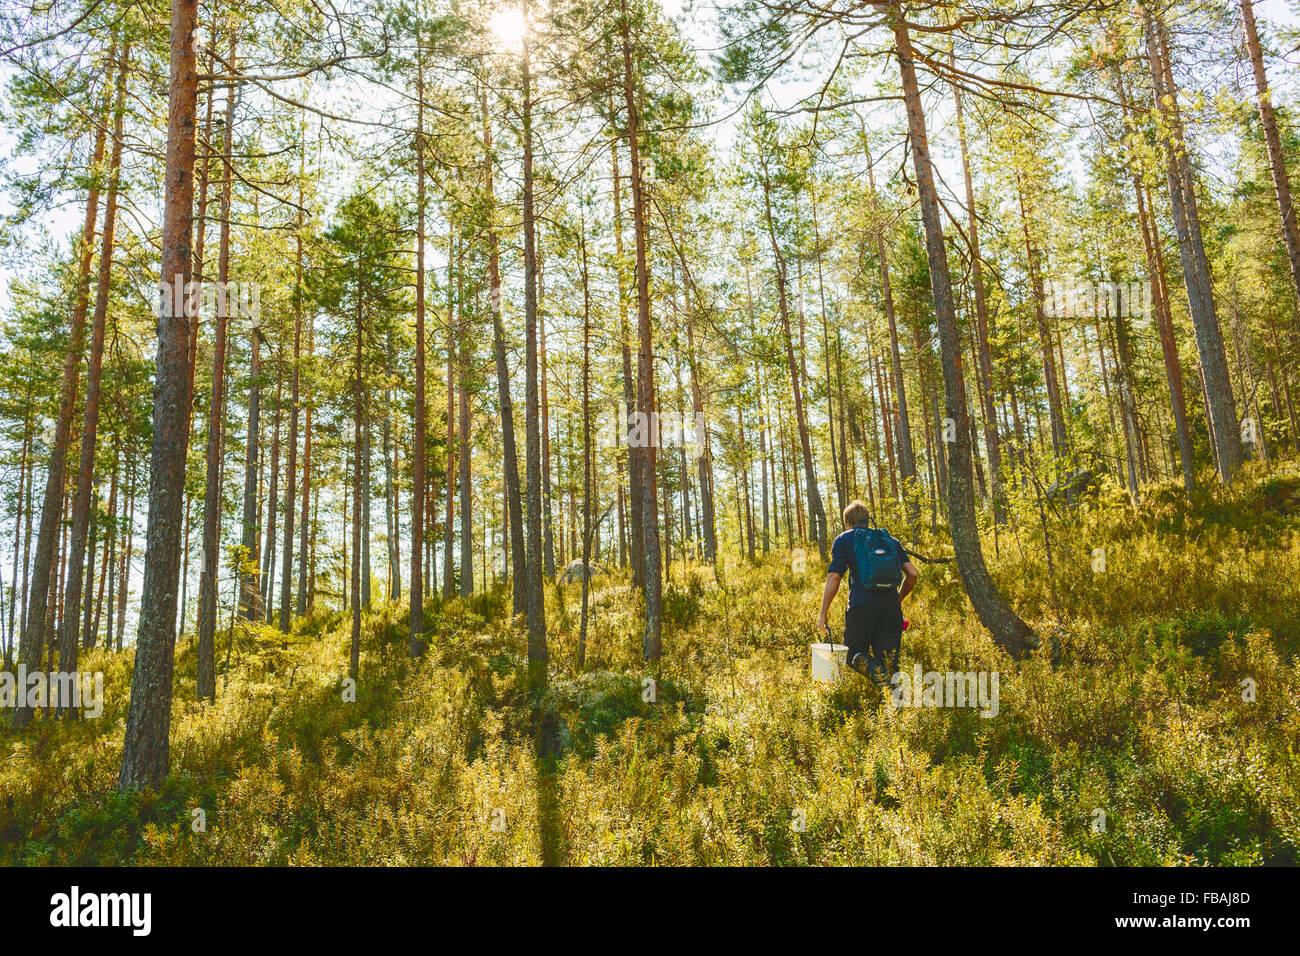 Finland, Keski-Suomi, Jyvaskyla, Man walking in pine forest Stock Photo